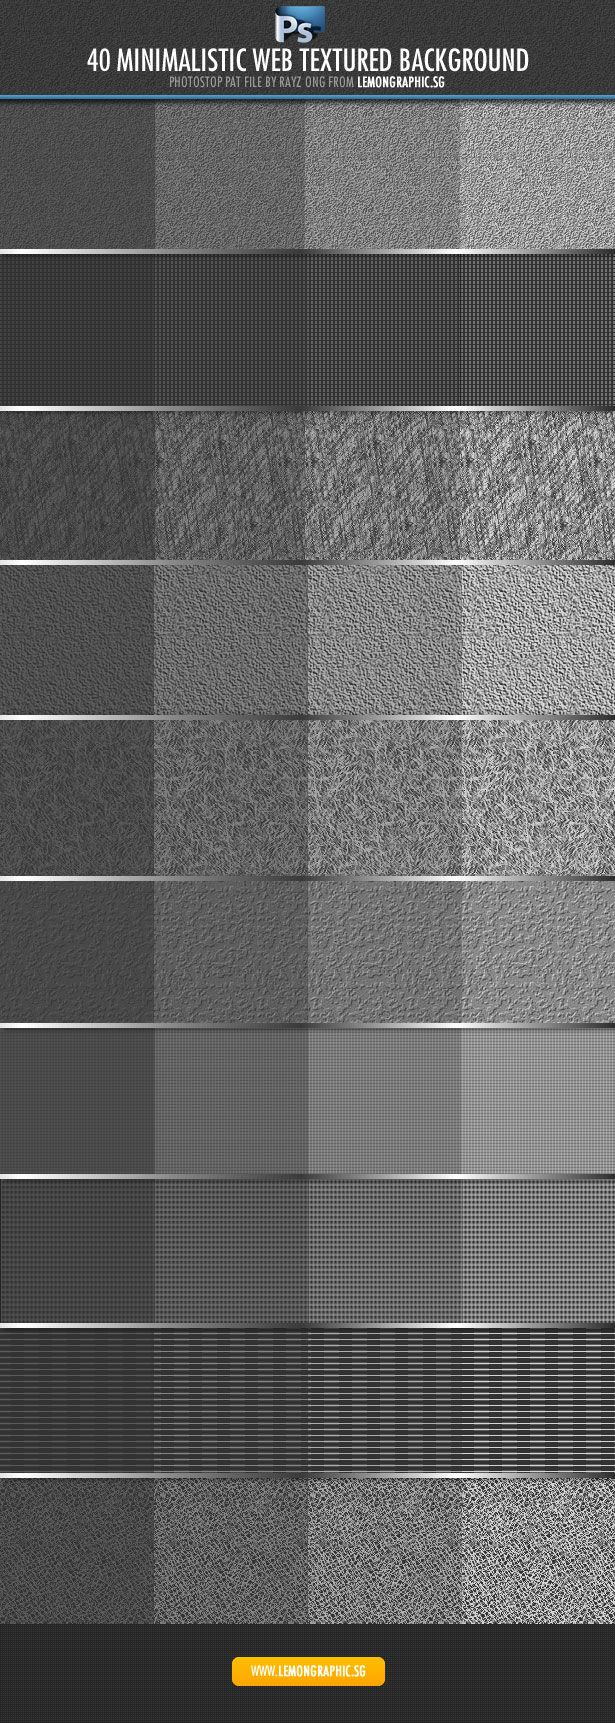 http://www.webdesignerdepot.com/2012/05/free-download-40-exclusive-photoshop-patterns/